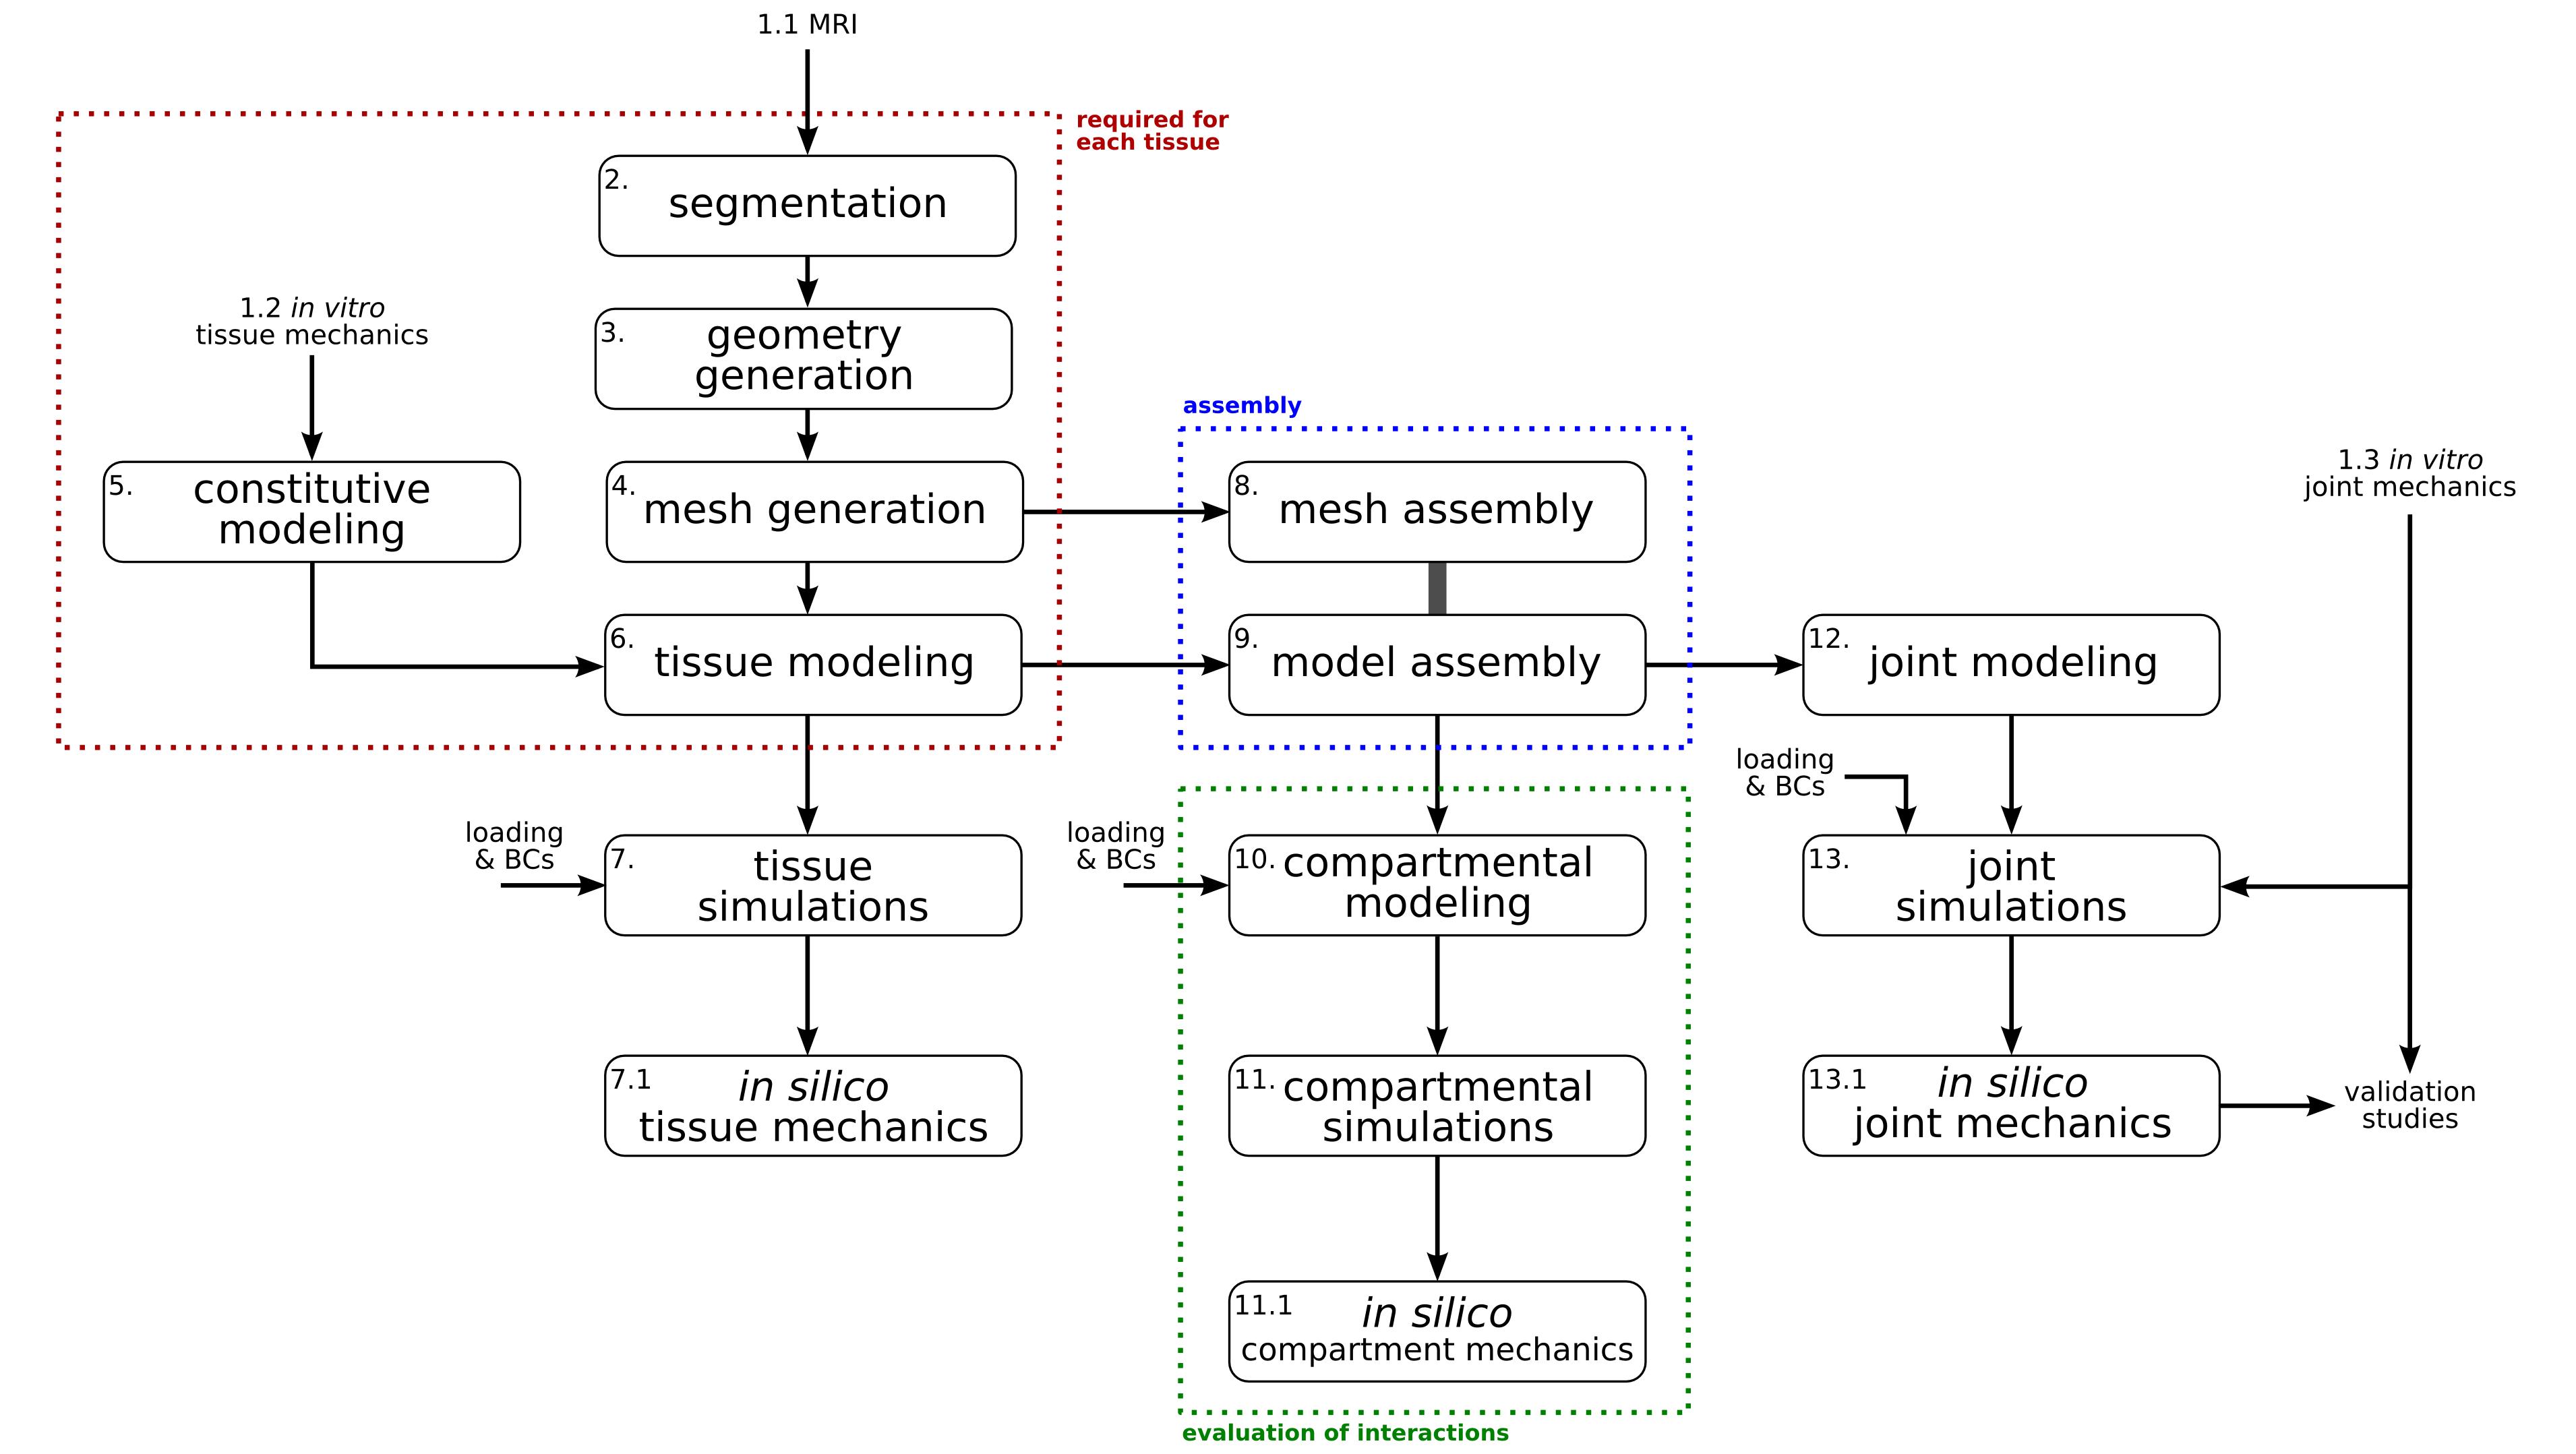 Modeling & Simulation Workflow